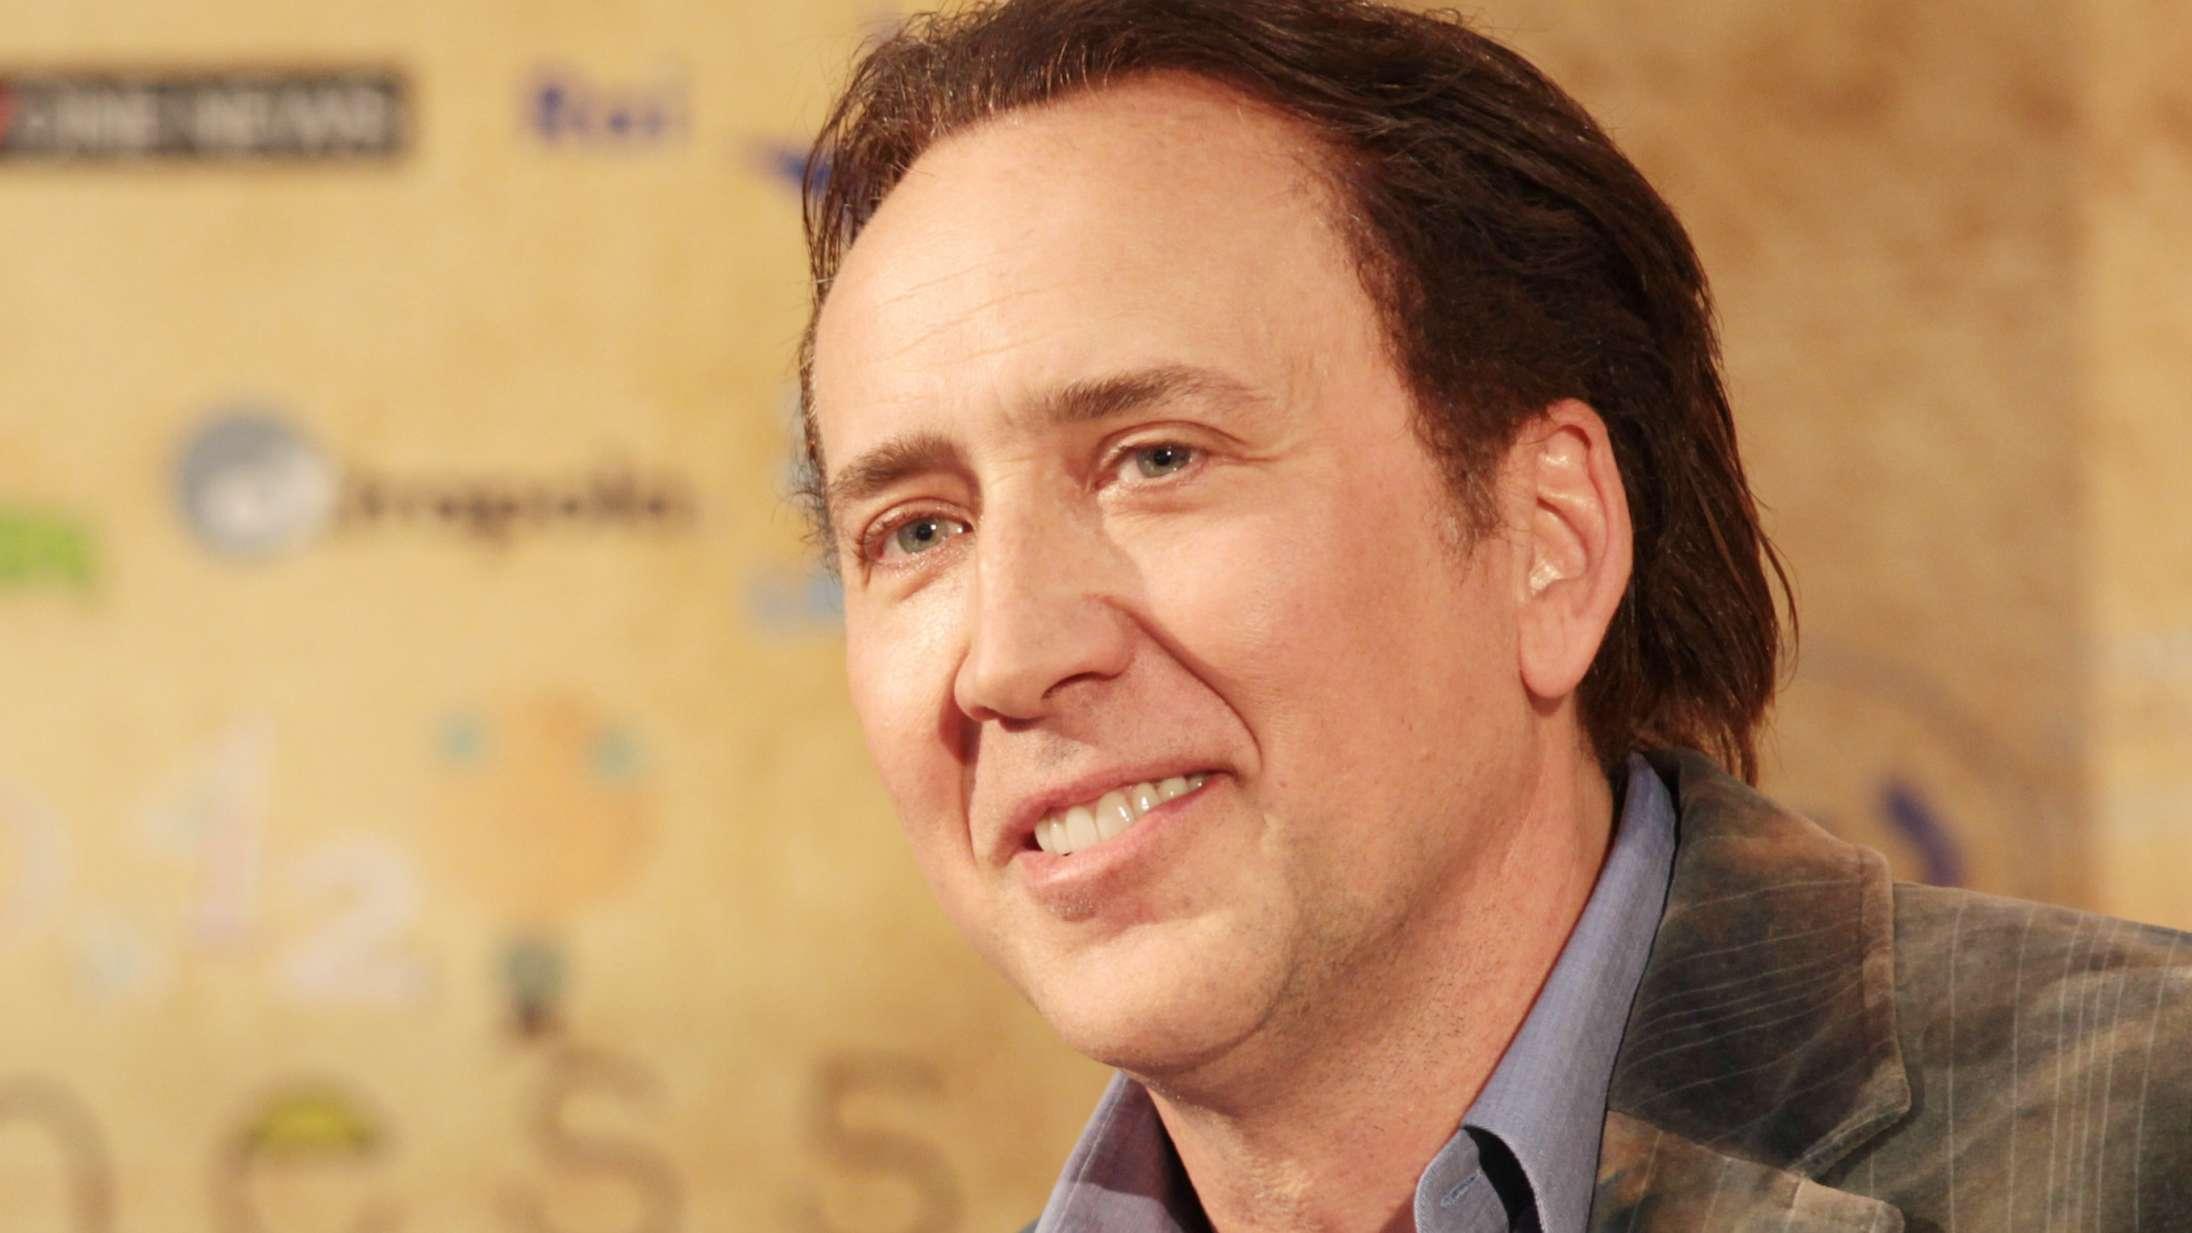 Nicolas Cage skal spille Joe Exotic i ny tv-serie